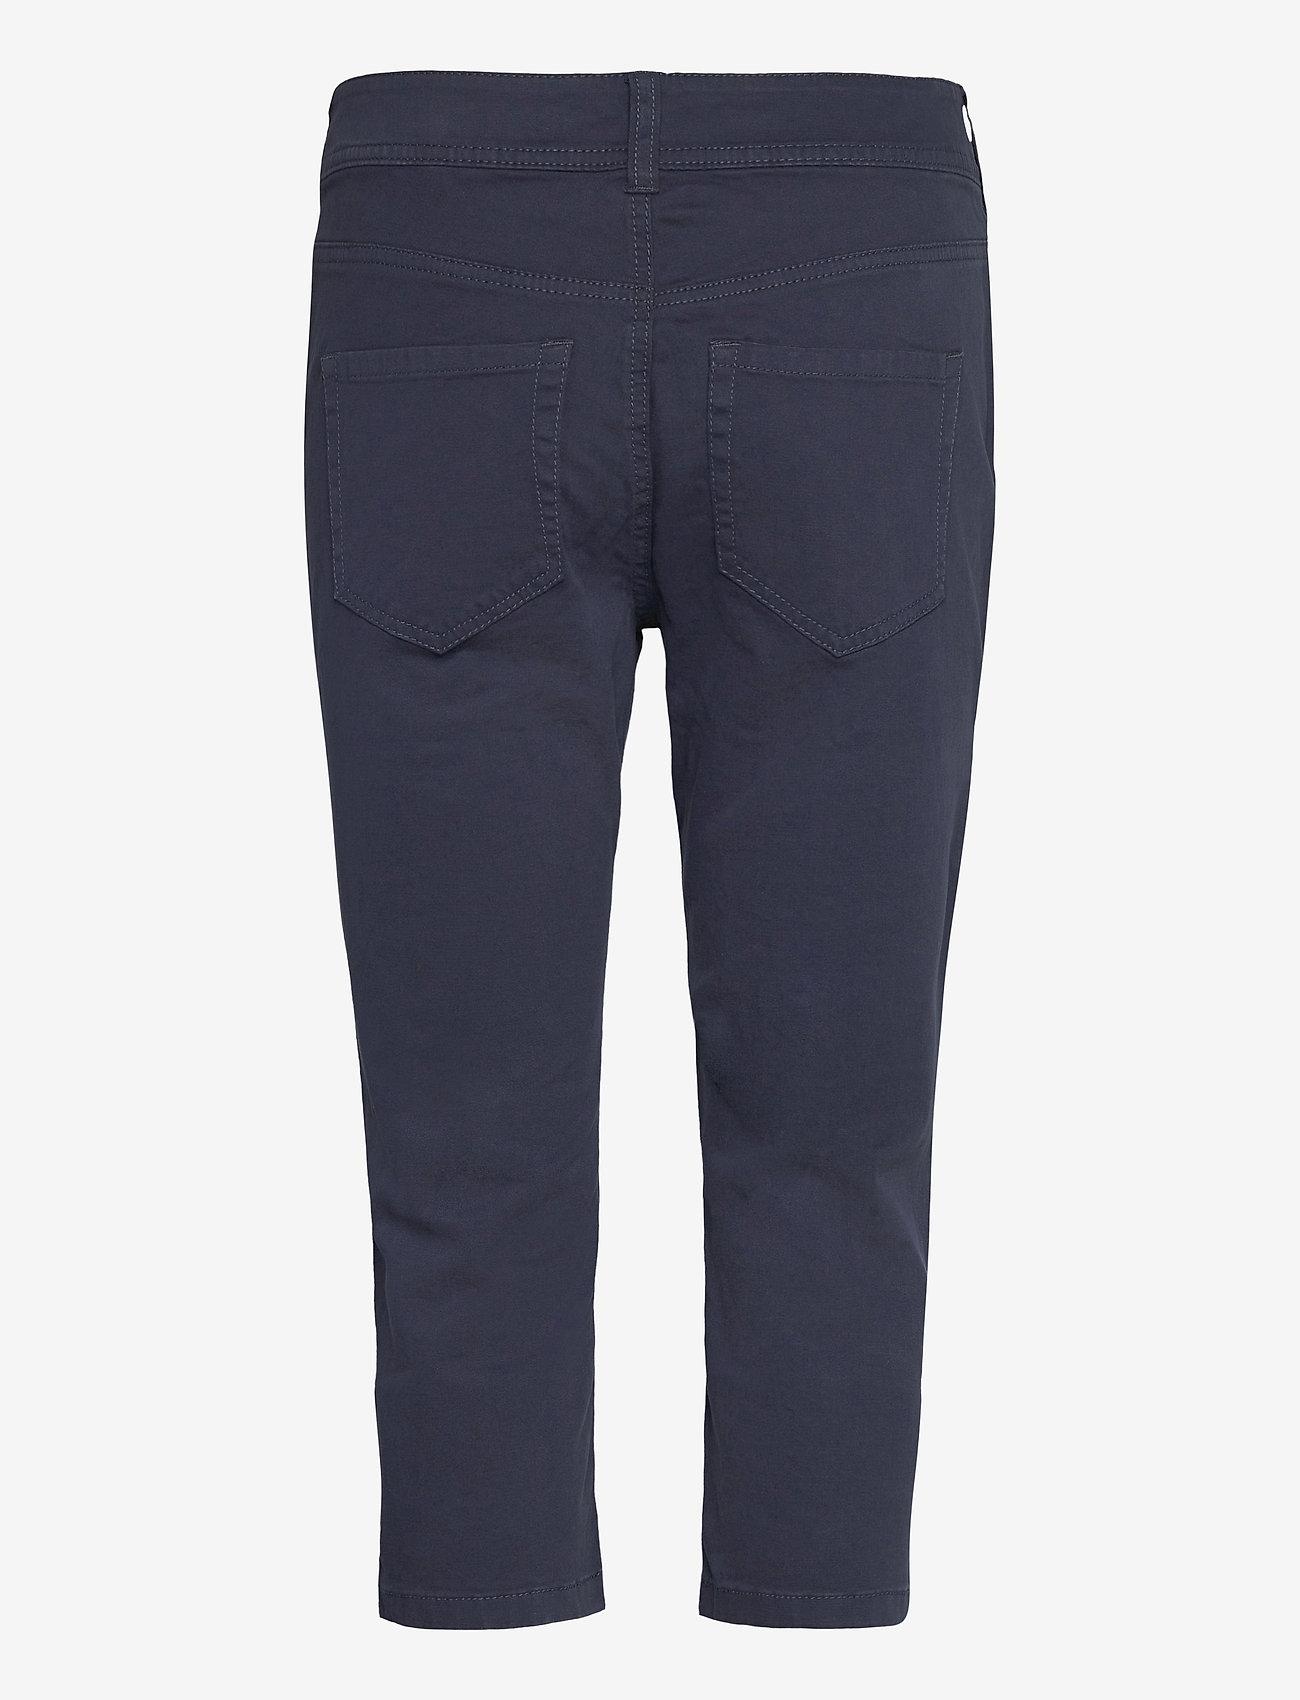 Tom Tailor - Tom Tailor K - pantalons capri - sky captain blue - 1